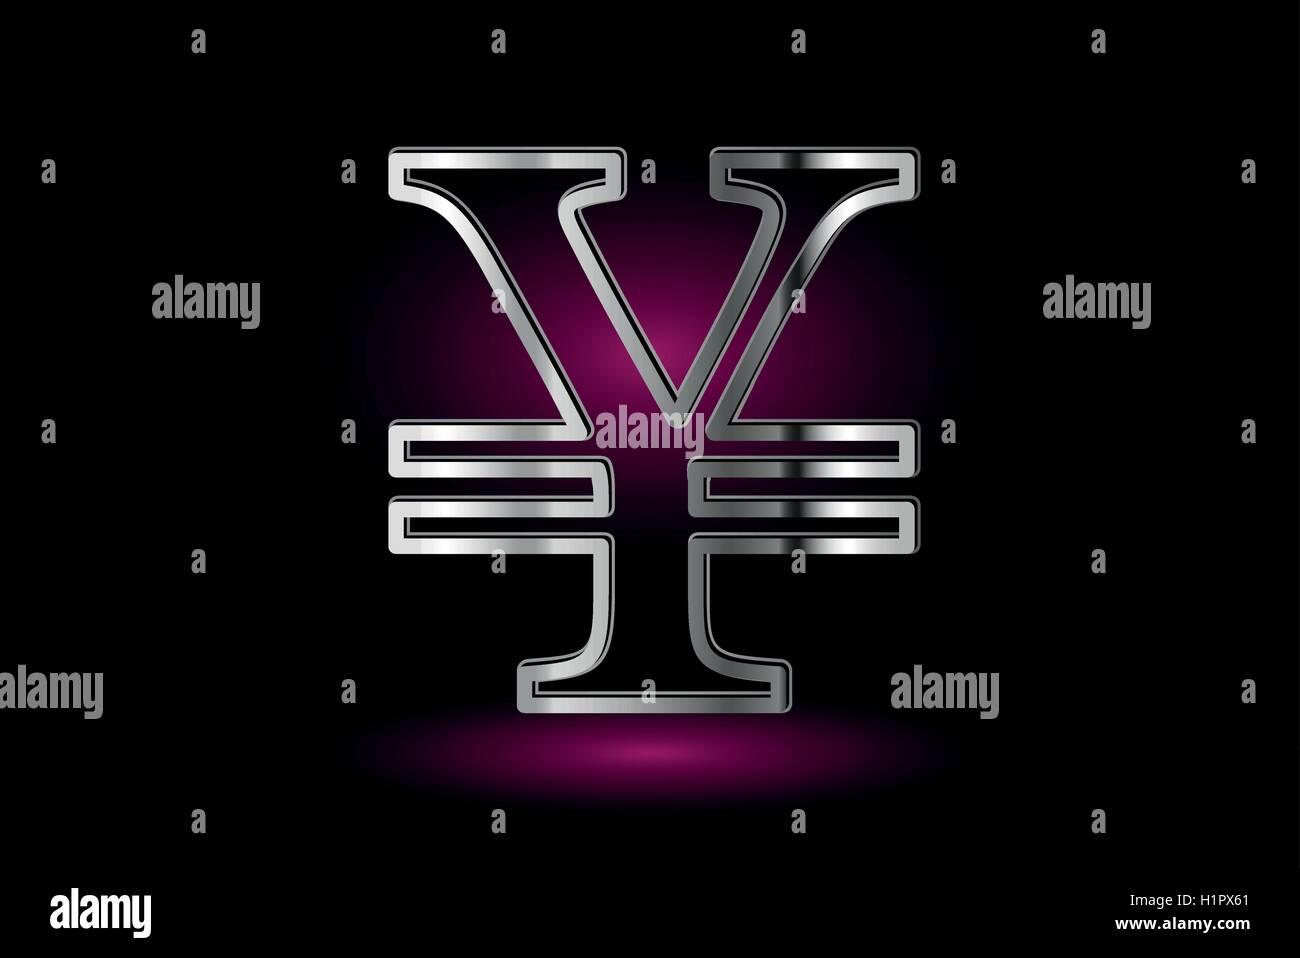 Yen symbol, Yen currency symbol, - Stock Image